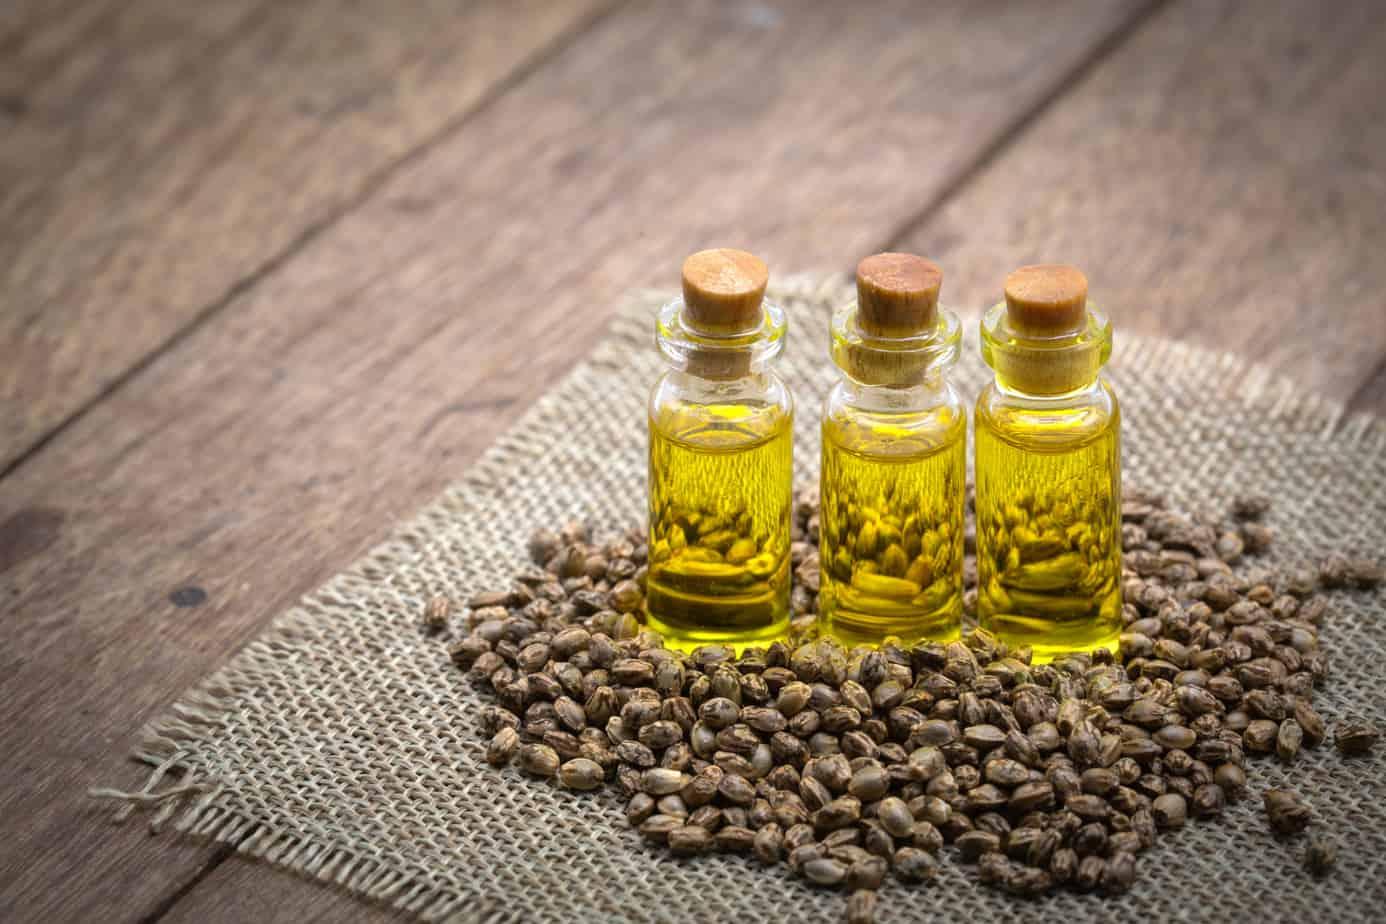 cbd hemp oil products cannabis oil against marijuana plant herbal treatment alternative medicine 163296017